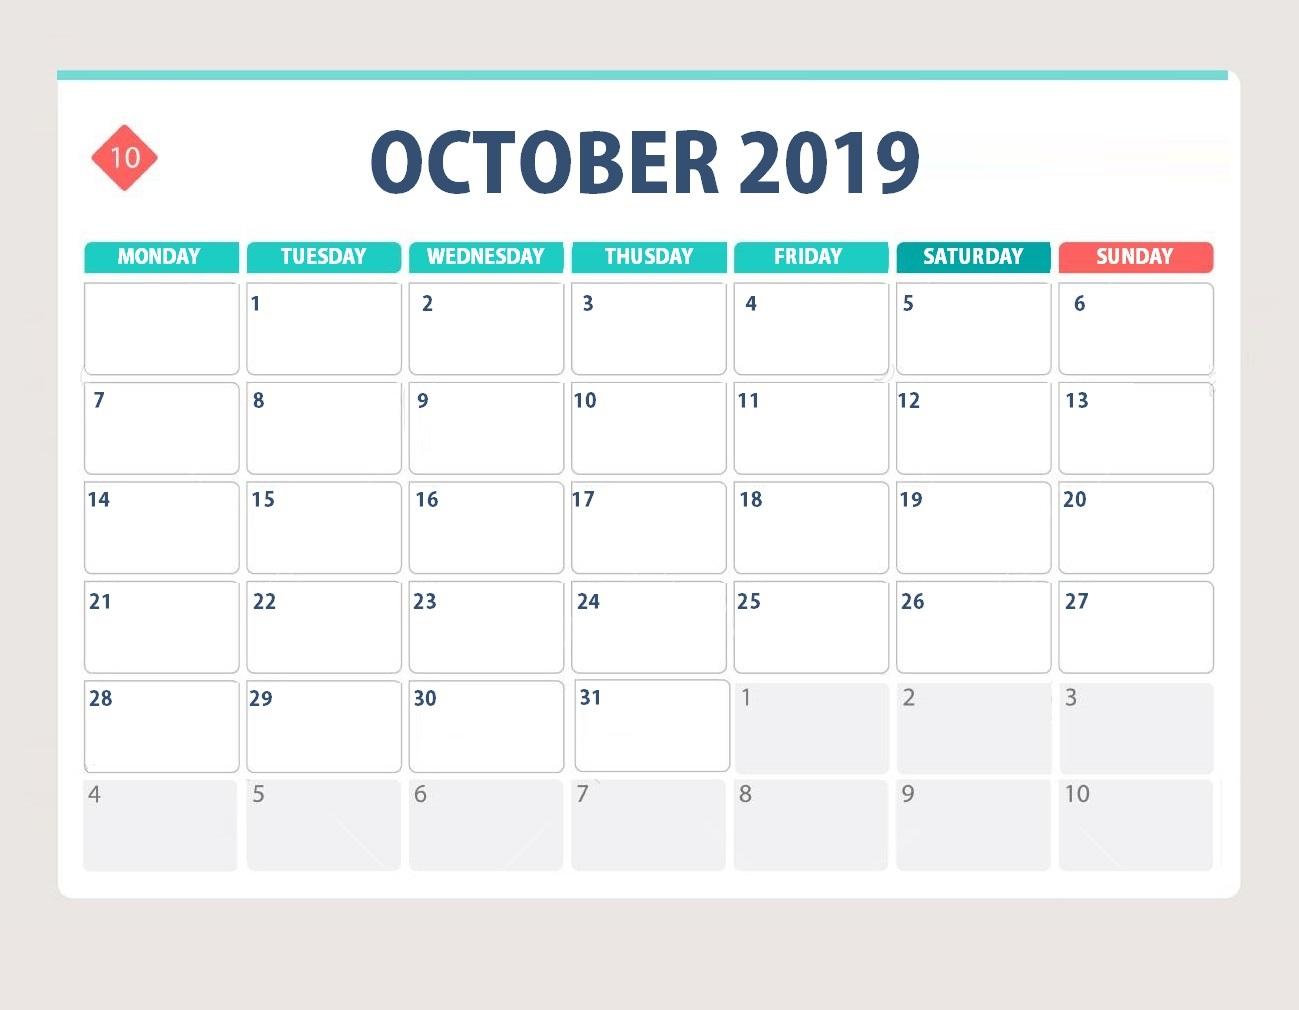 Blank October 2019 Desk Calendar